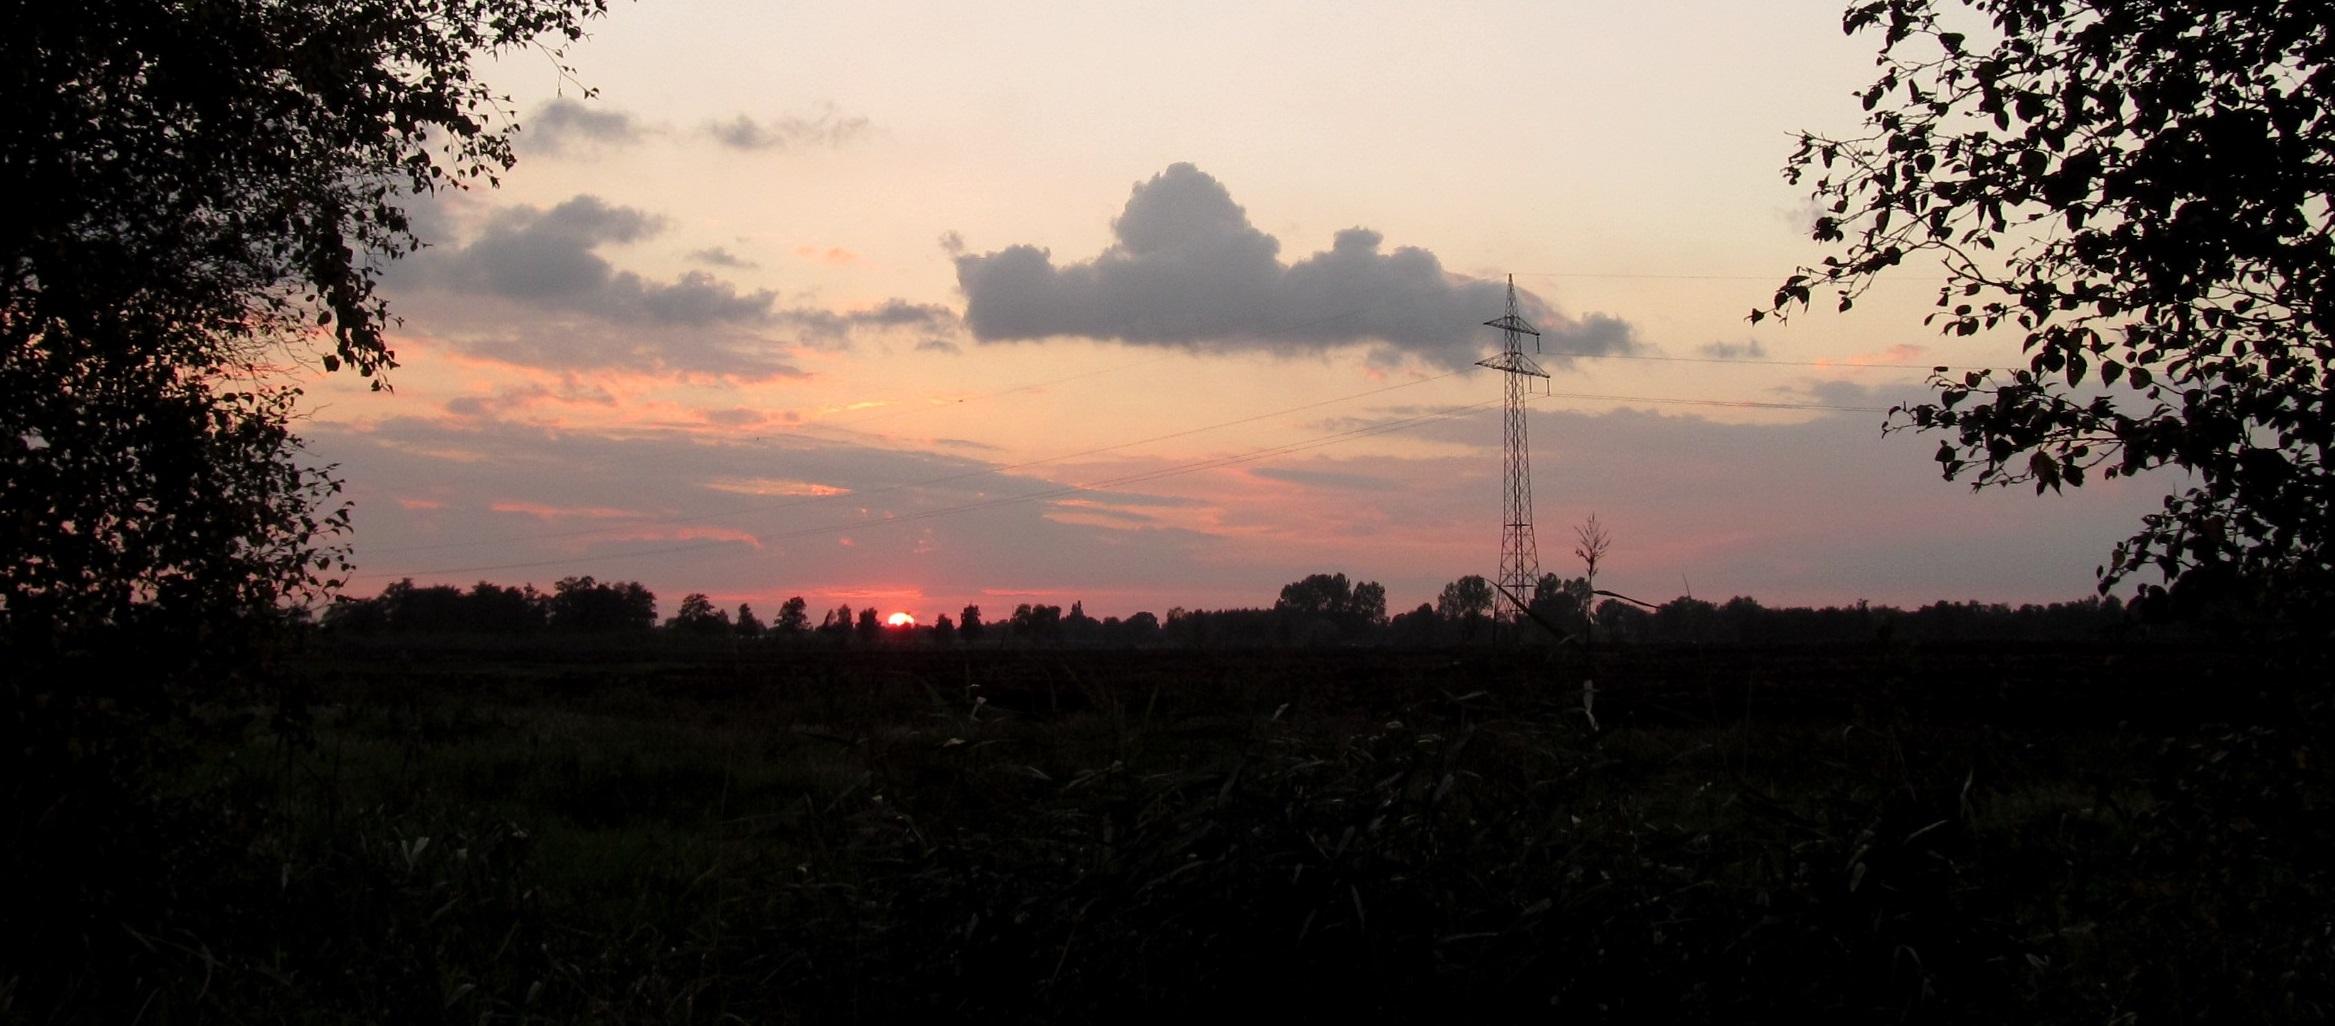 Sonnenuntergang im Wolfsbrucher Moor an der  B 495